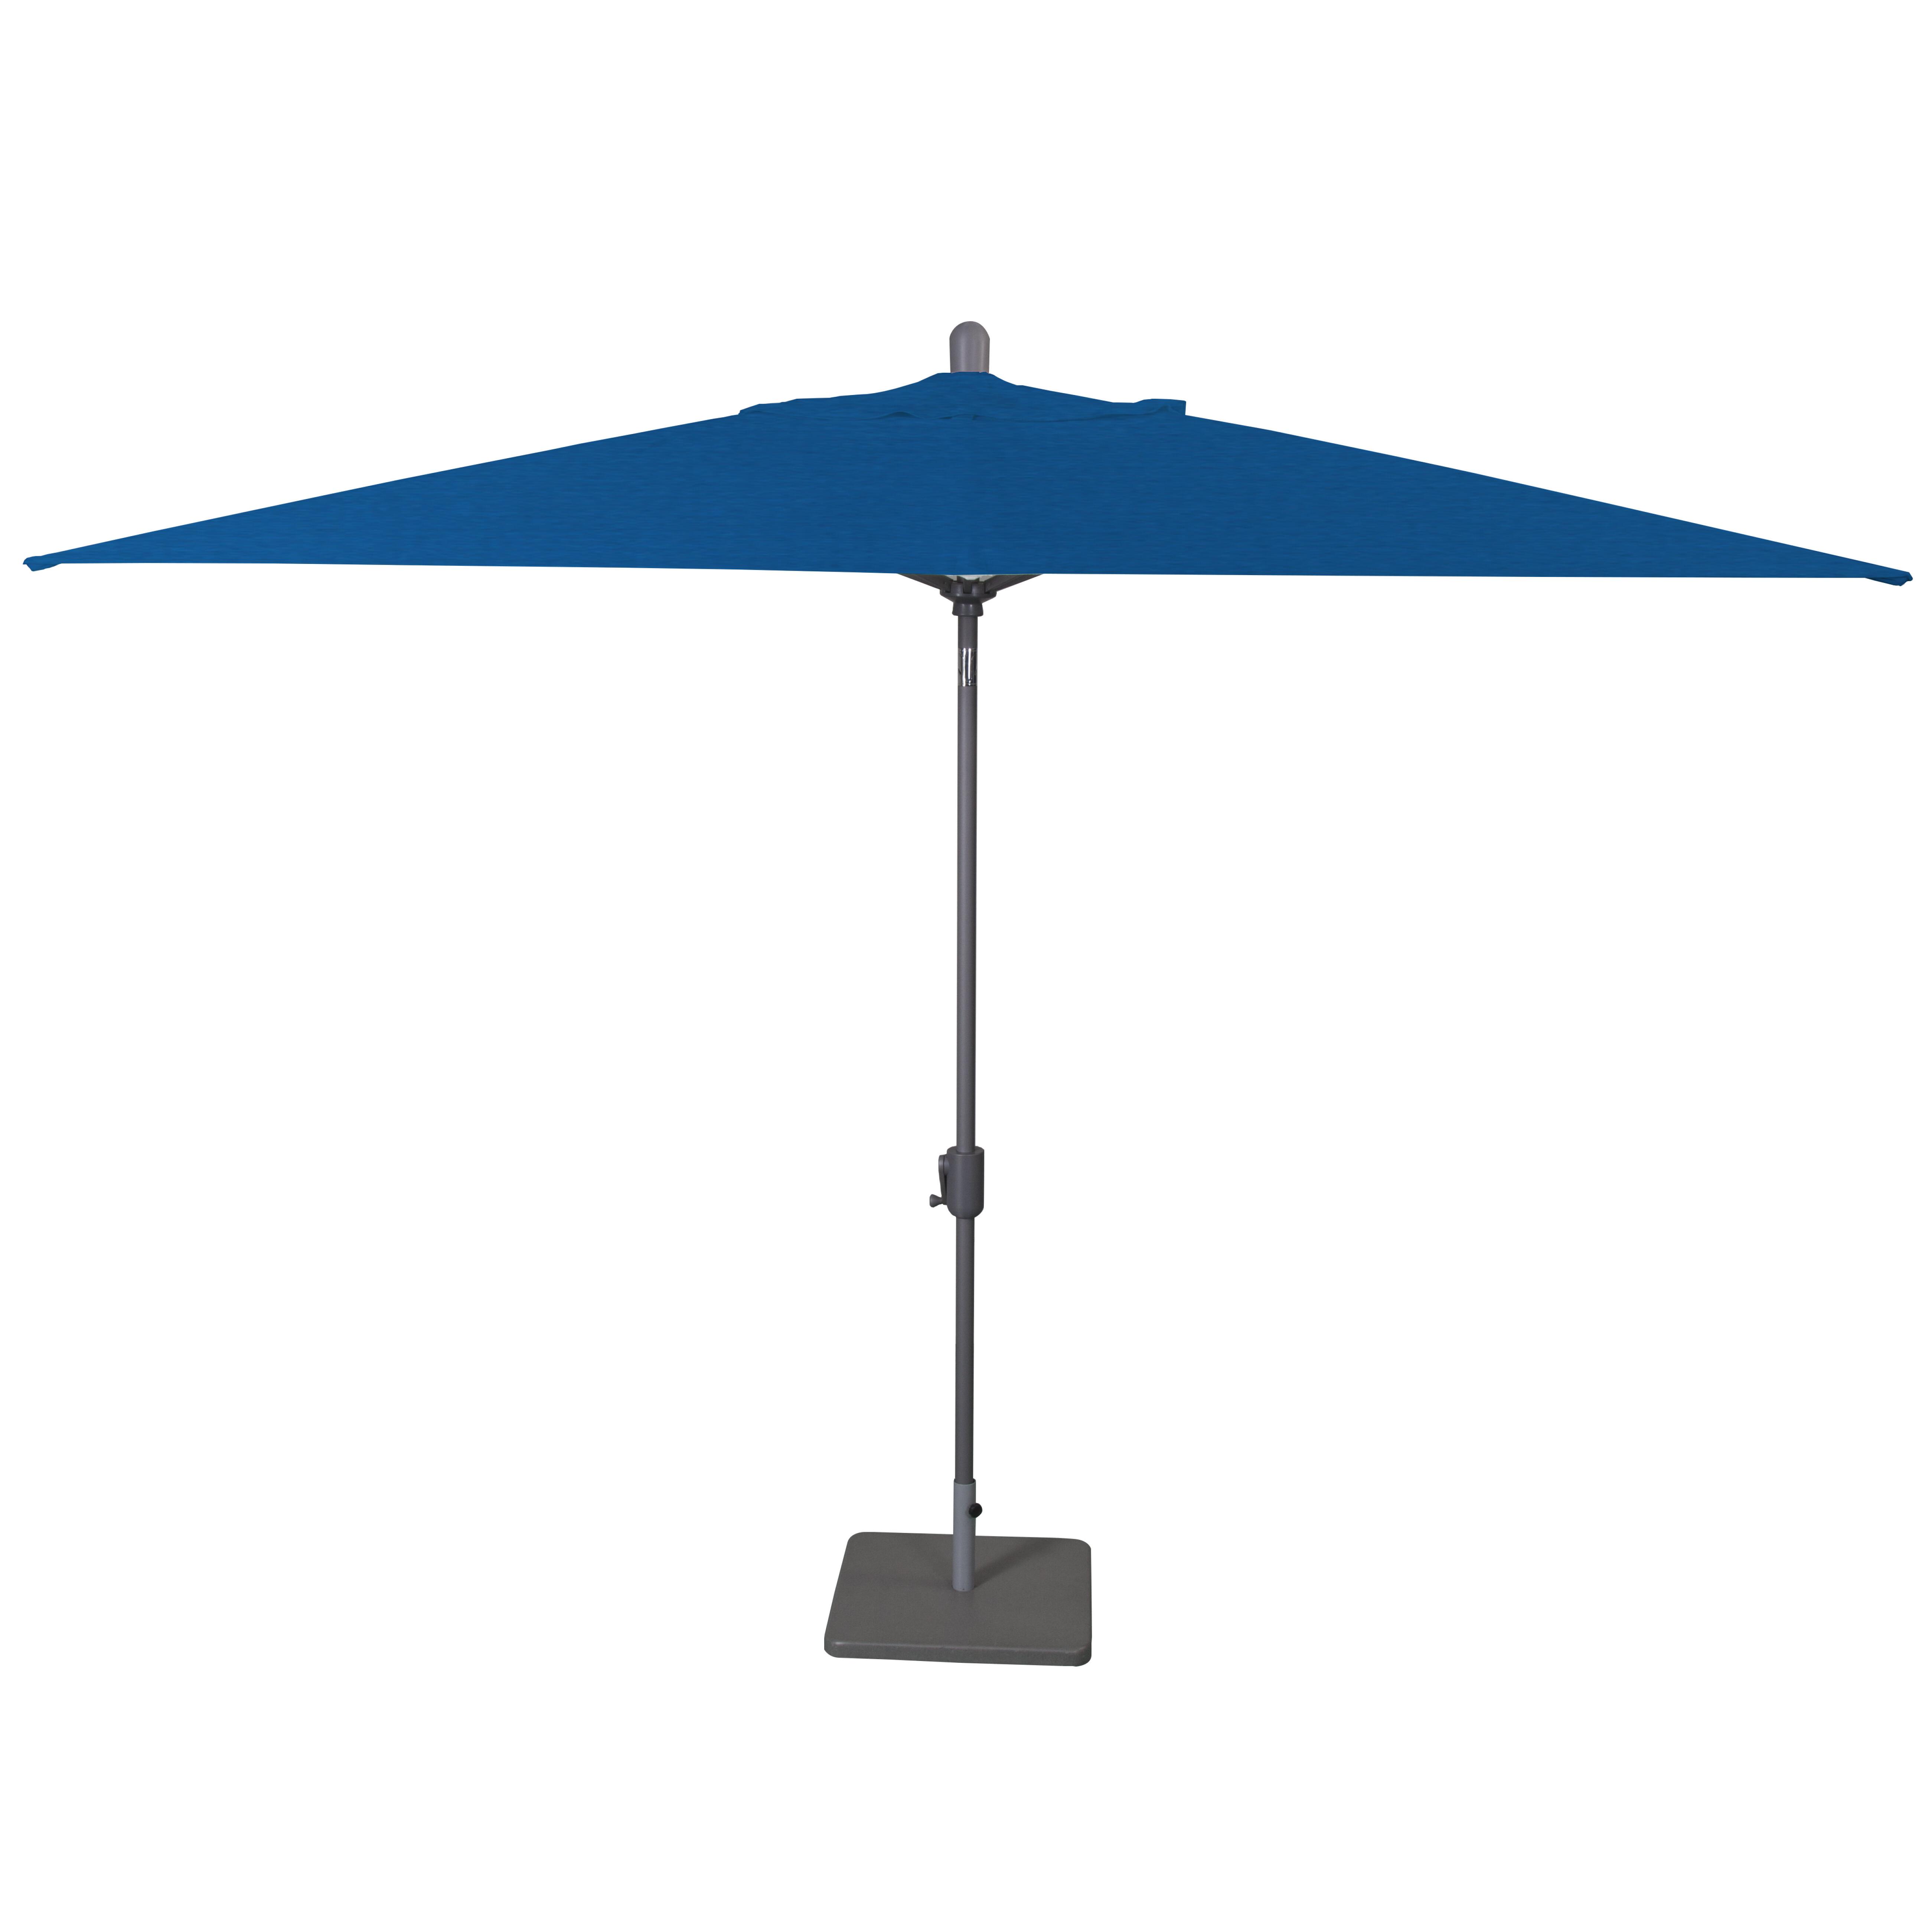 Dena Rectangular Market Umbrellas Intended For Widely Used Wieczorek Auto Tilt 10' X 6.5' Rectangular Market Sunbrella Umbrella (Gallery 16 of 20)